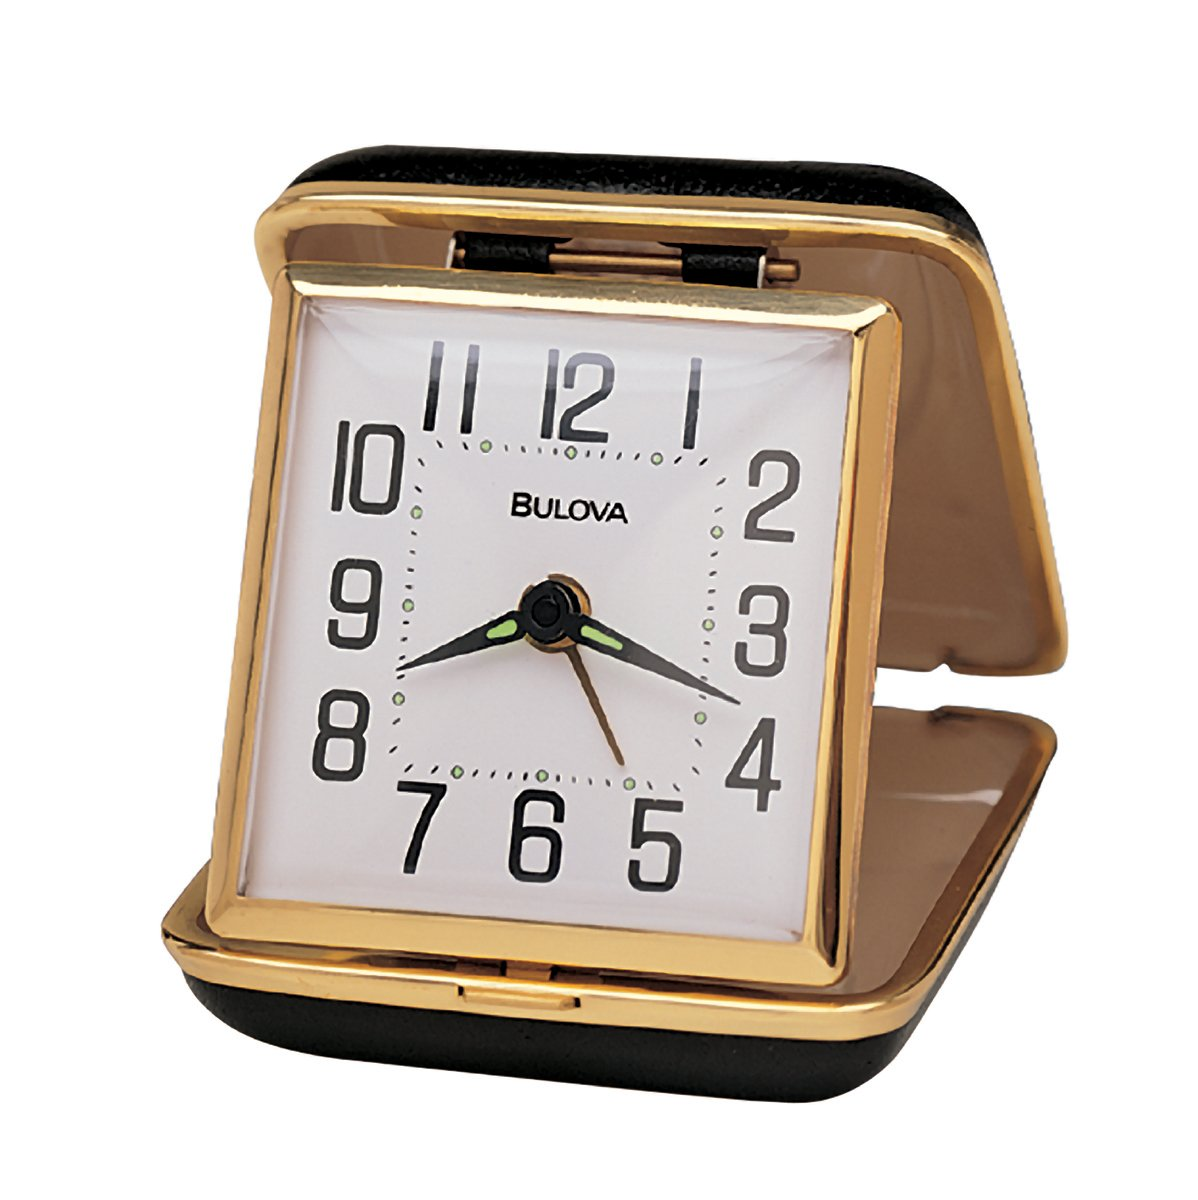 Bulova B6112 Mantle Clock Bulova Canada